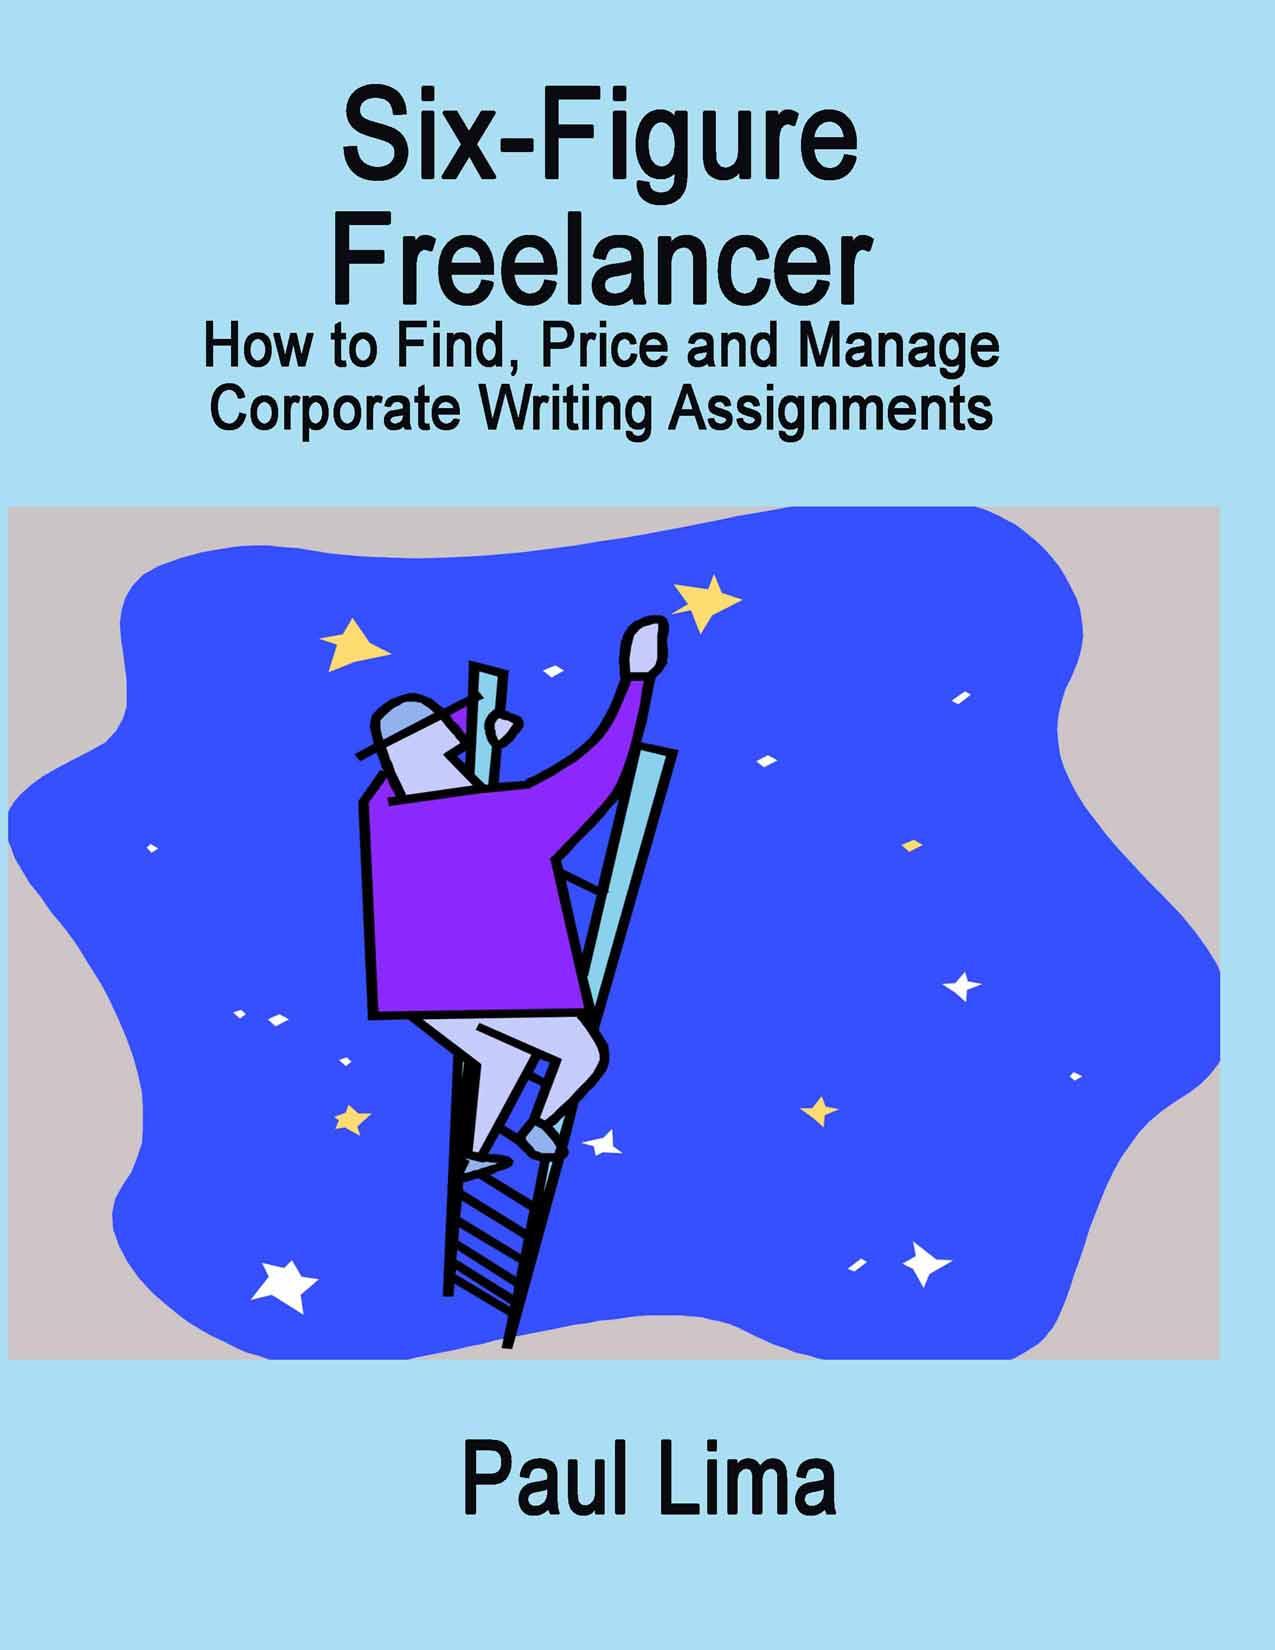 Six-Figure Freelancer by Paul Lima - Freelance Writer, Copywriter, Media Interview Training, Writing Coach